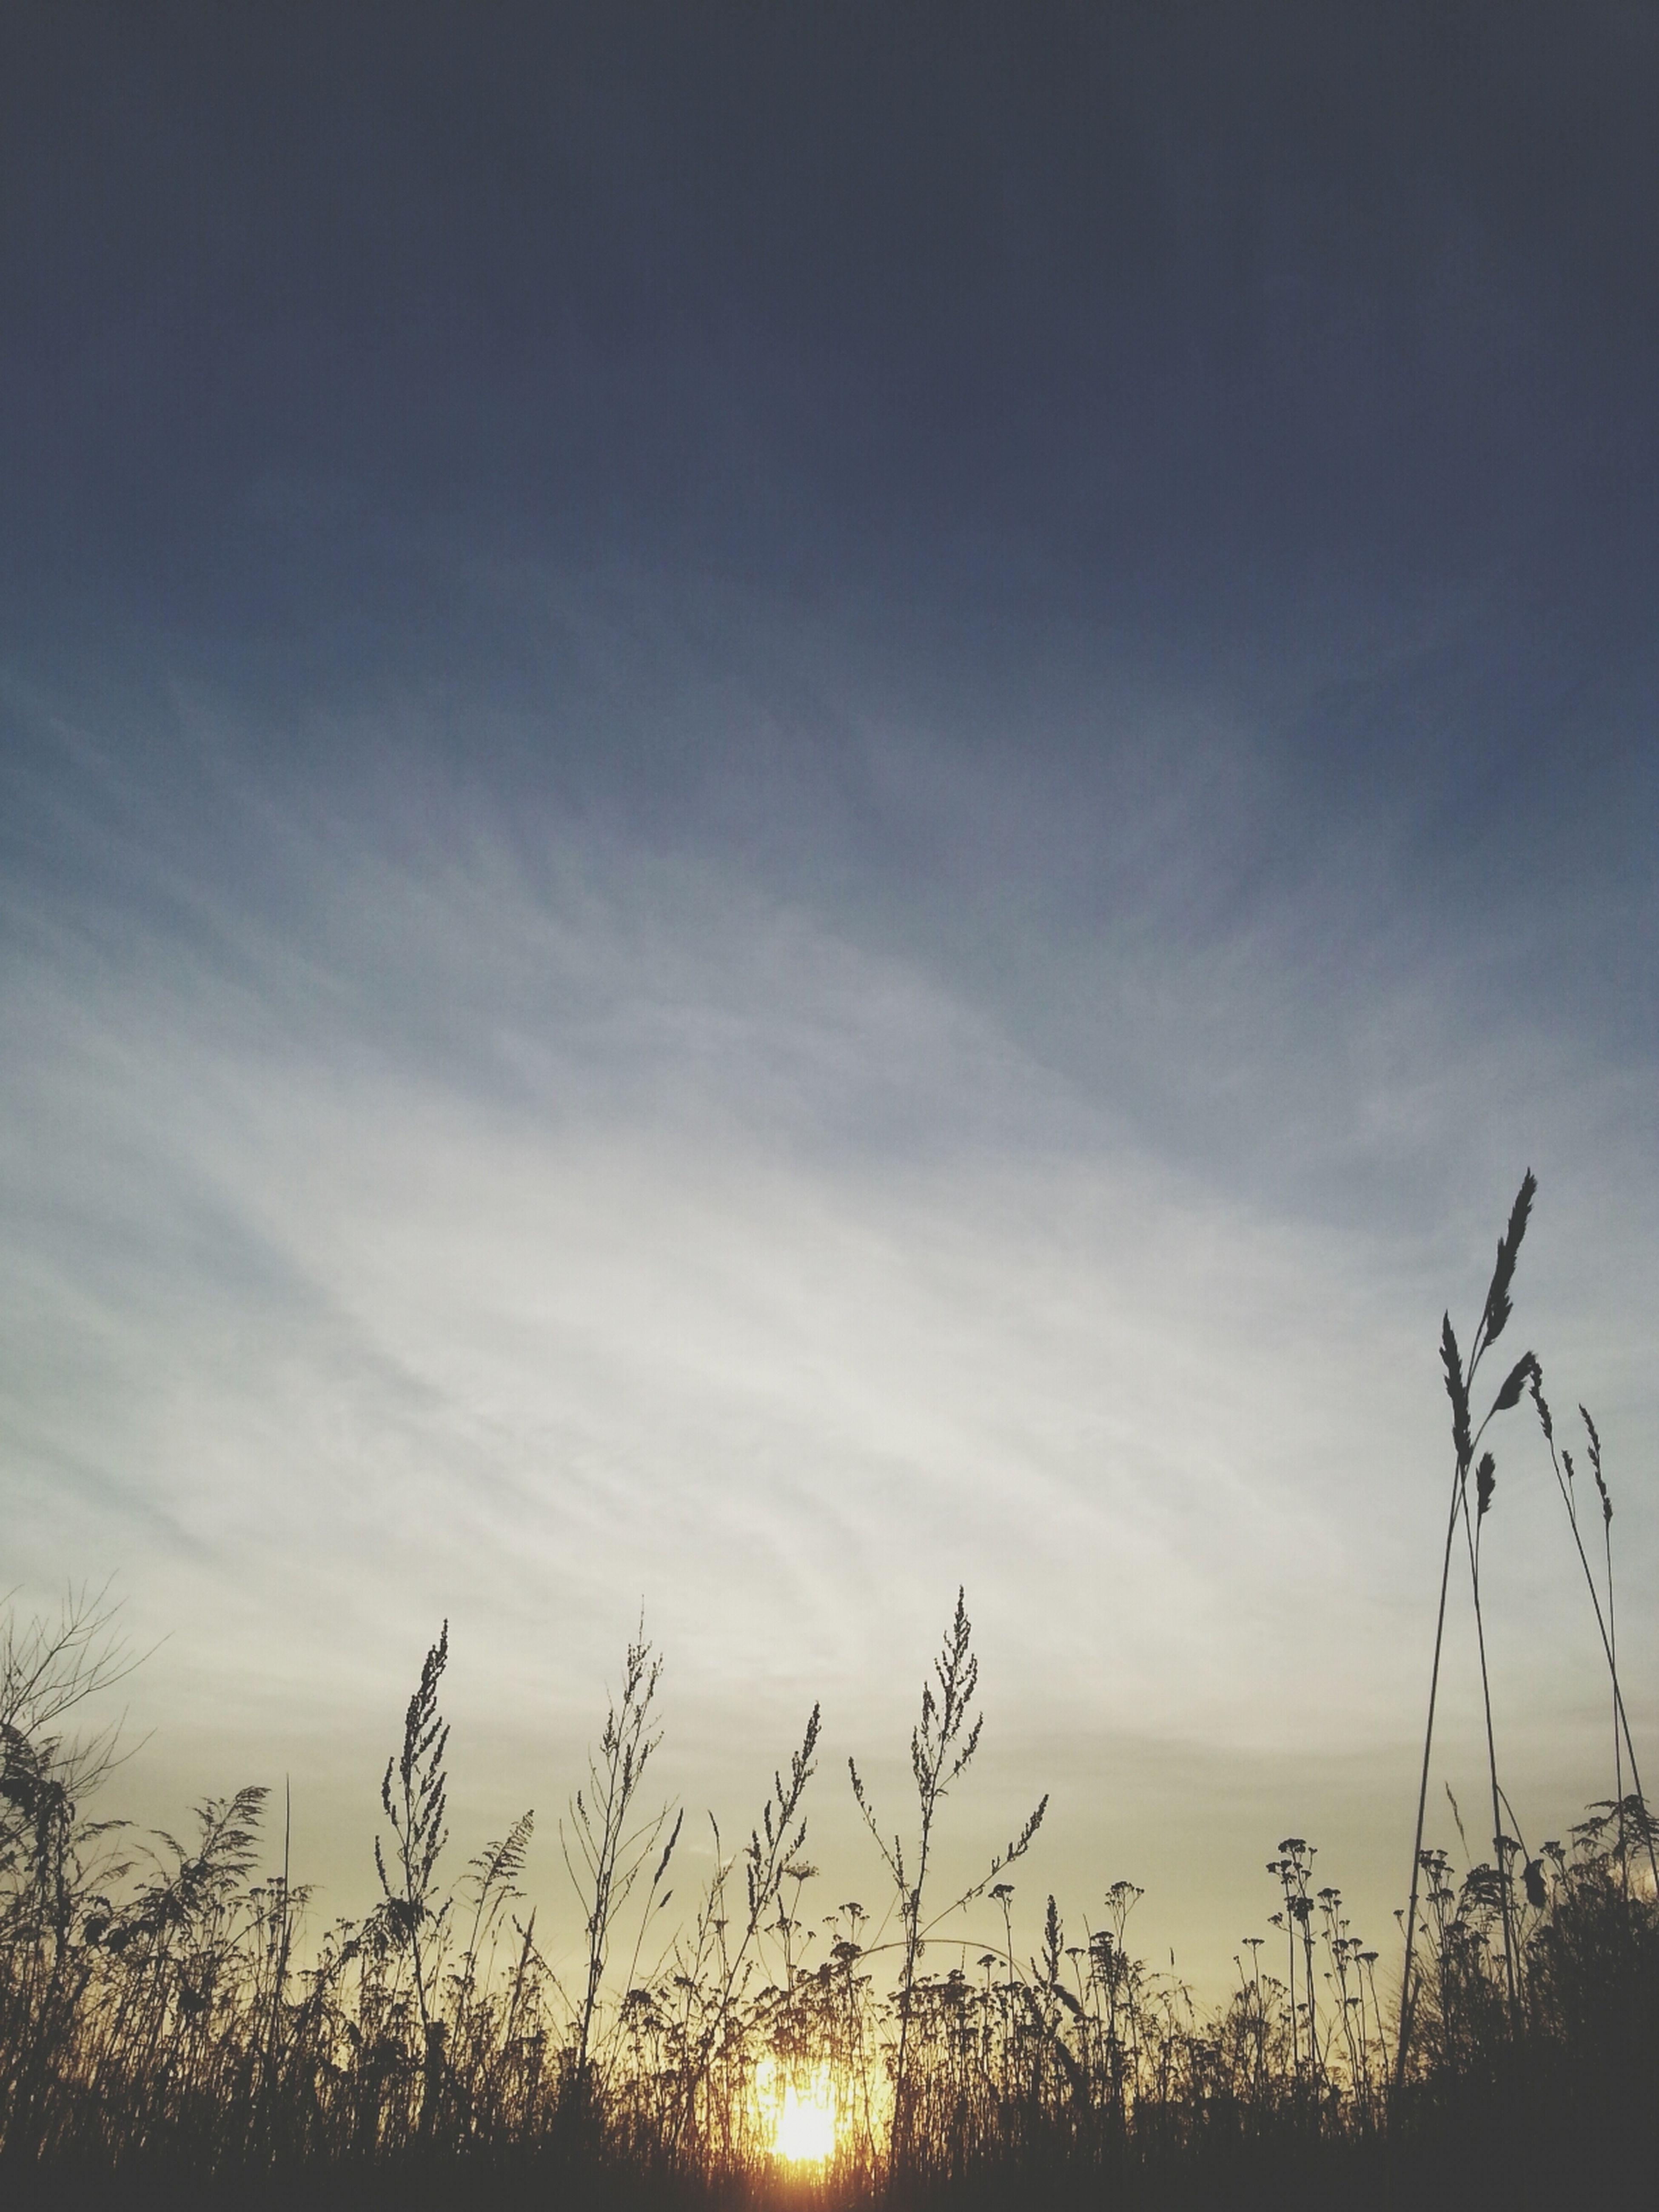 the sun dont shine whitout you ♧ Relaxing Hello World Sun Good Morning Sunshine perfect